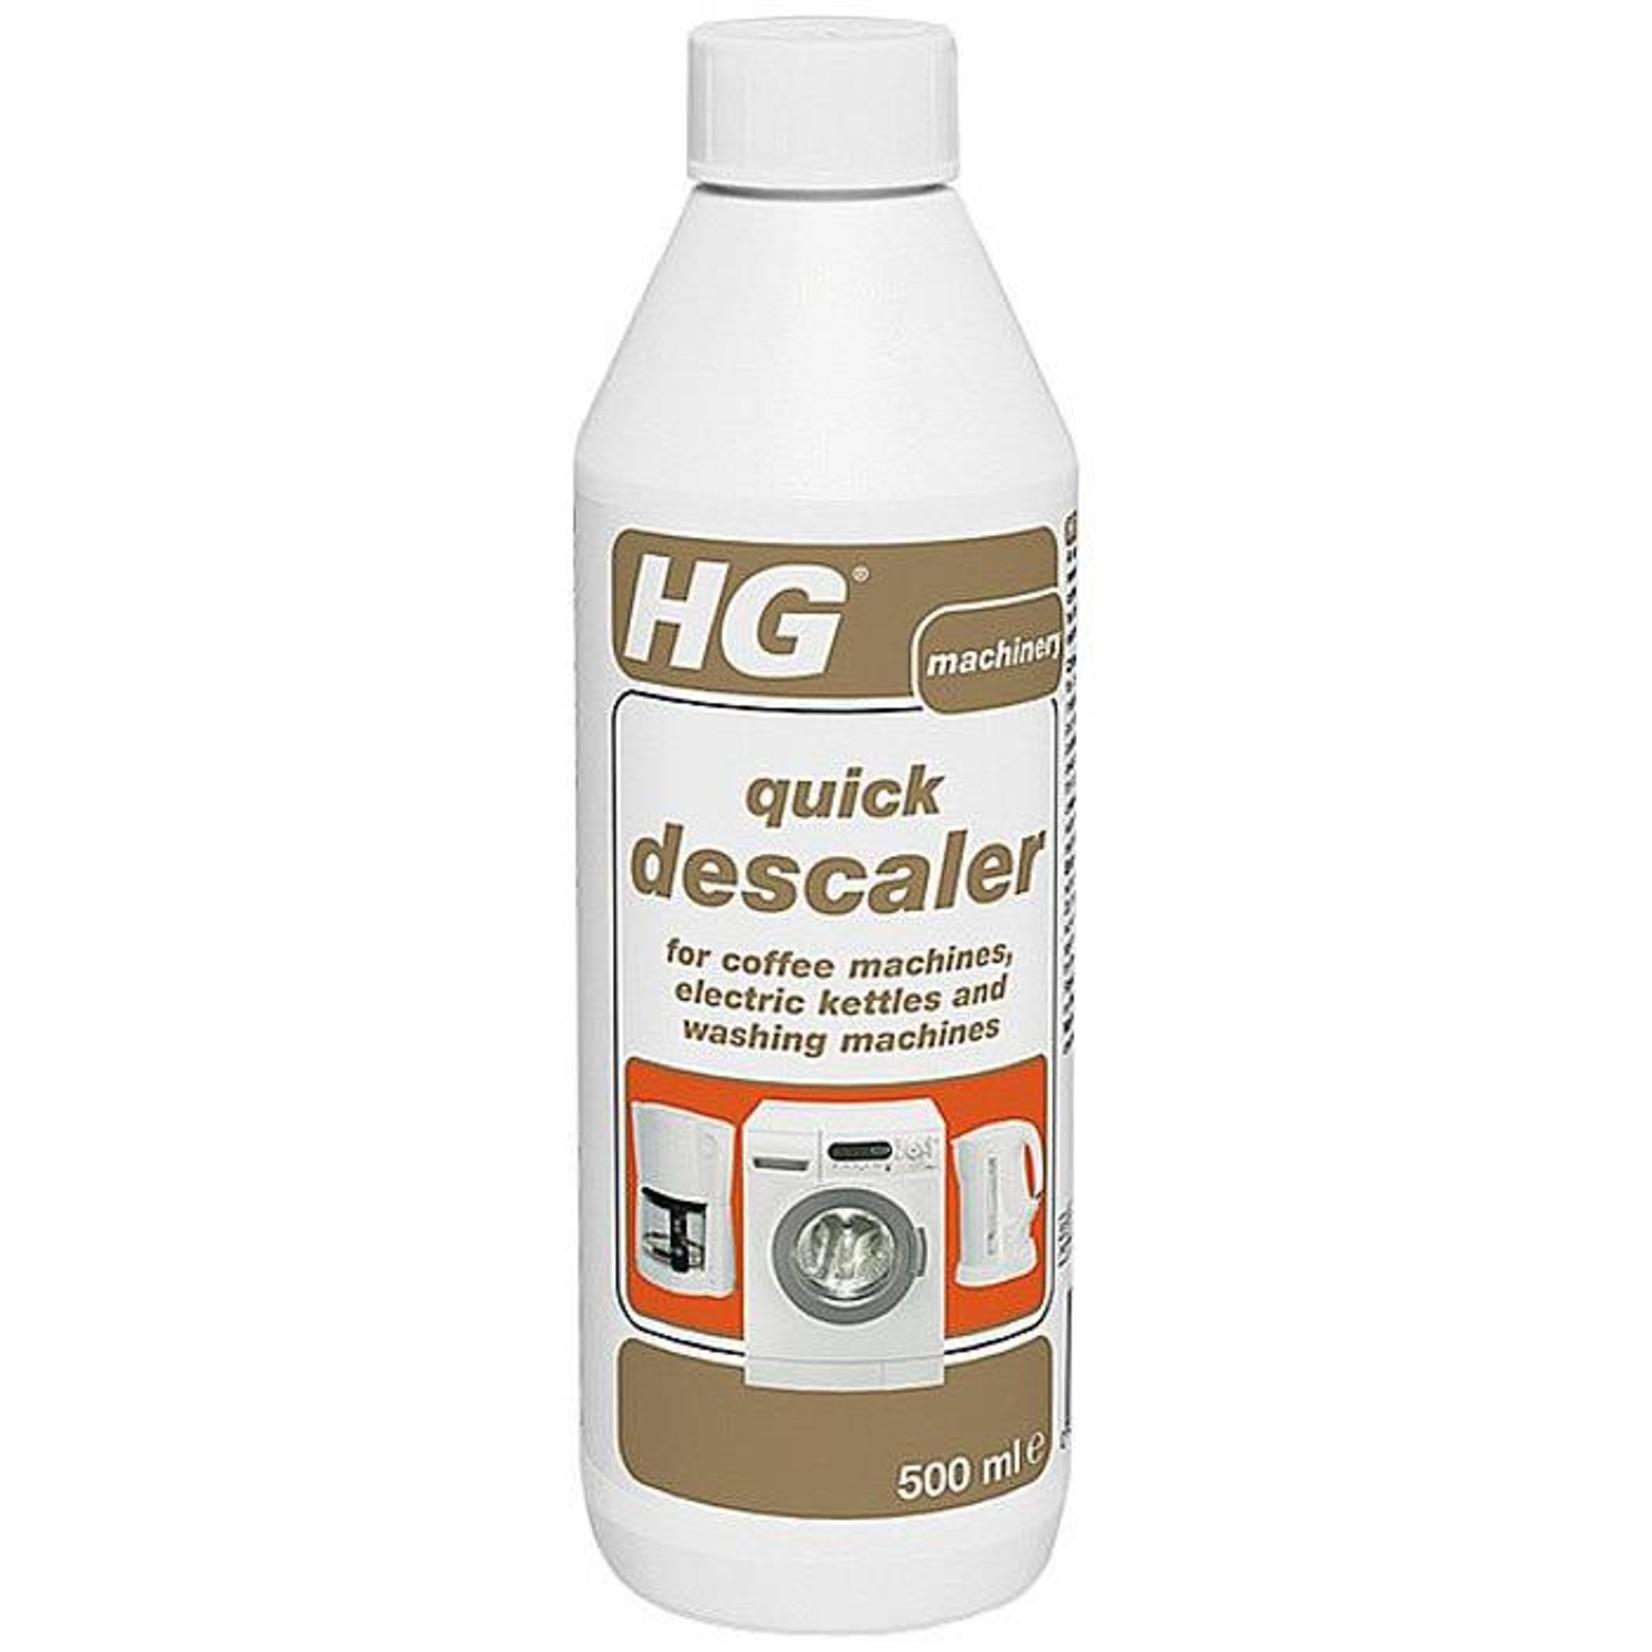 HG HG QUICK DESCALER MACHINERY